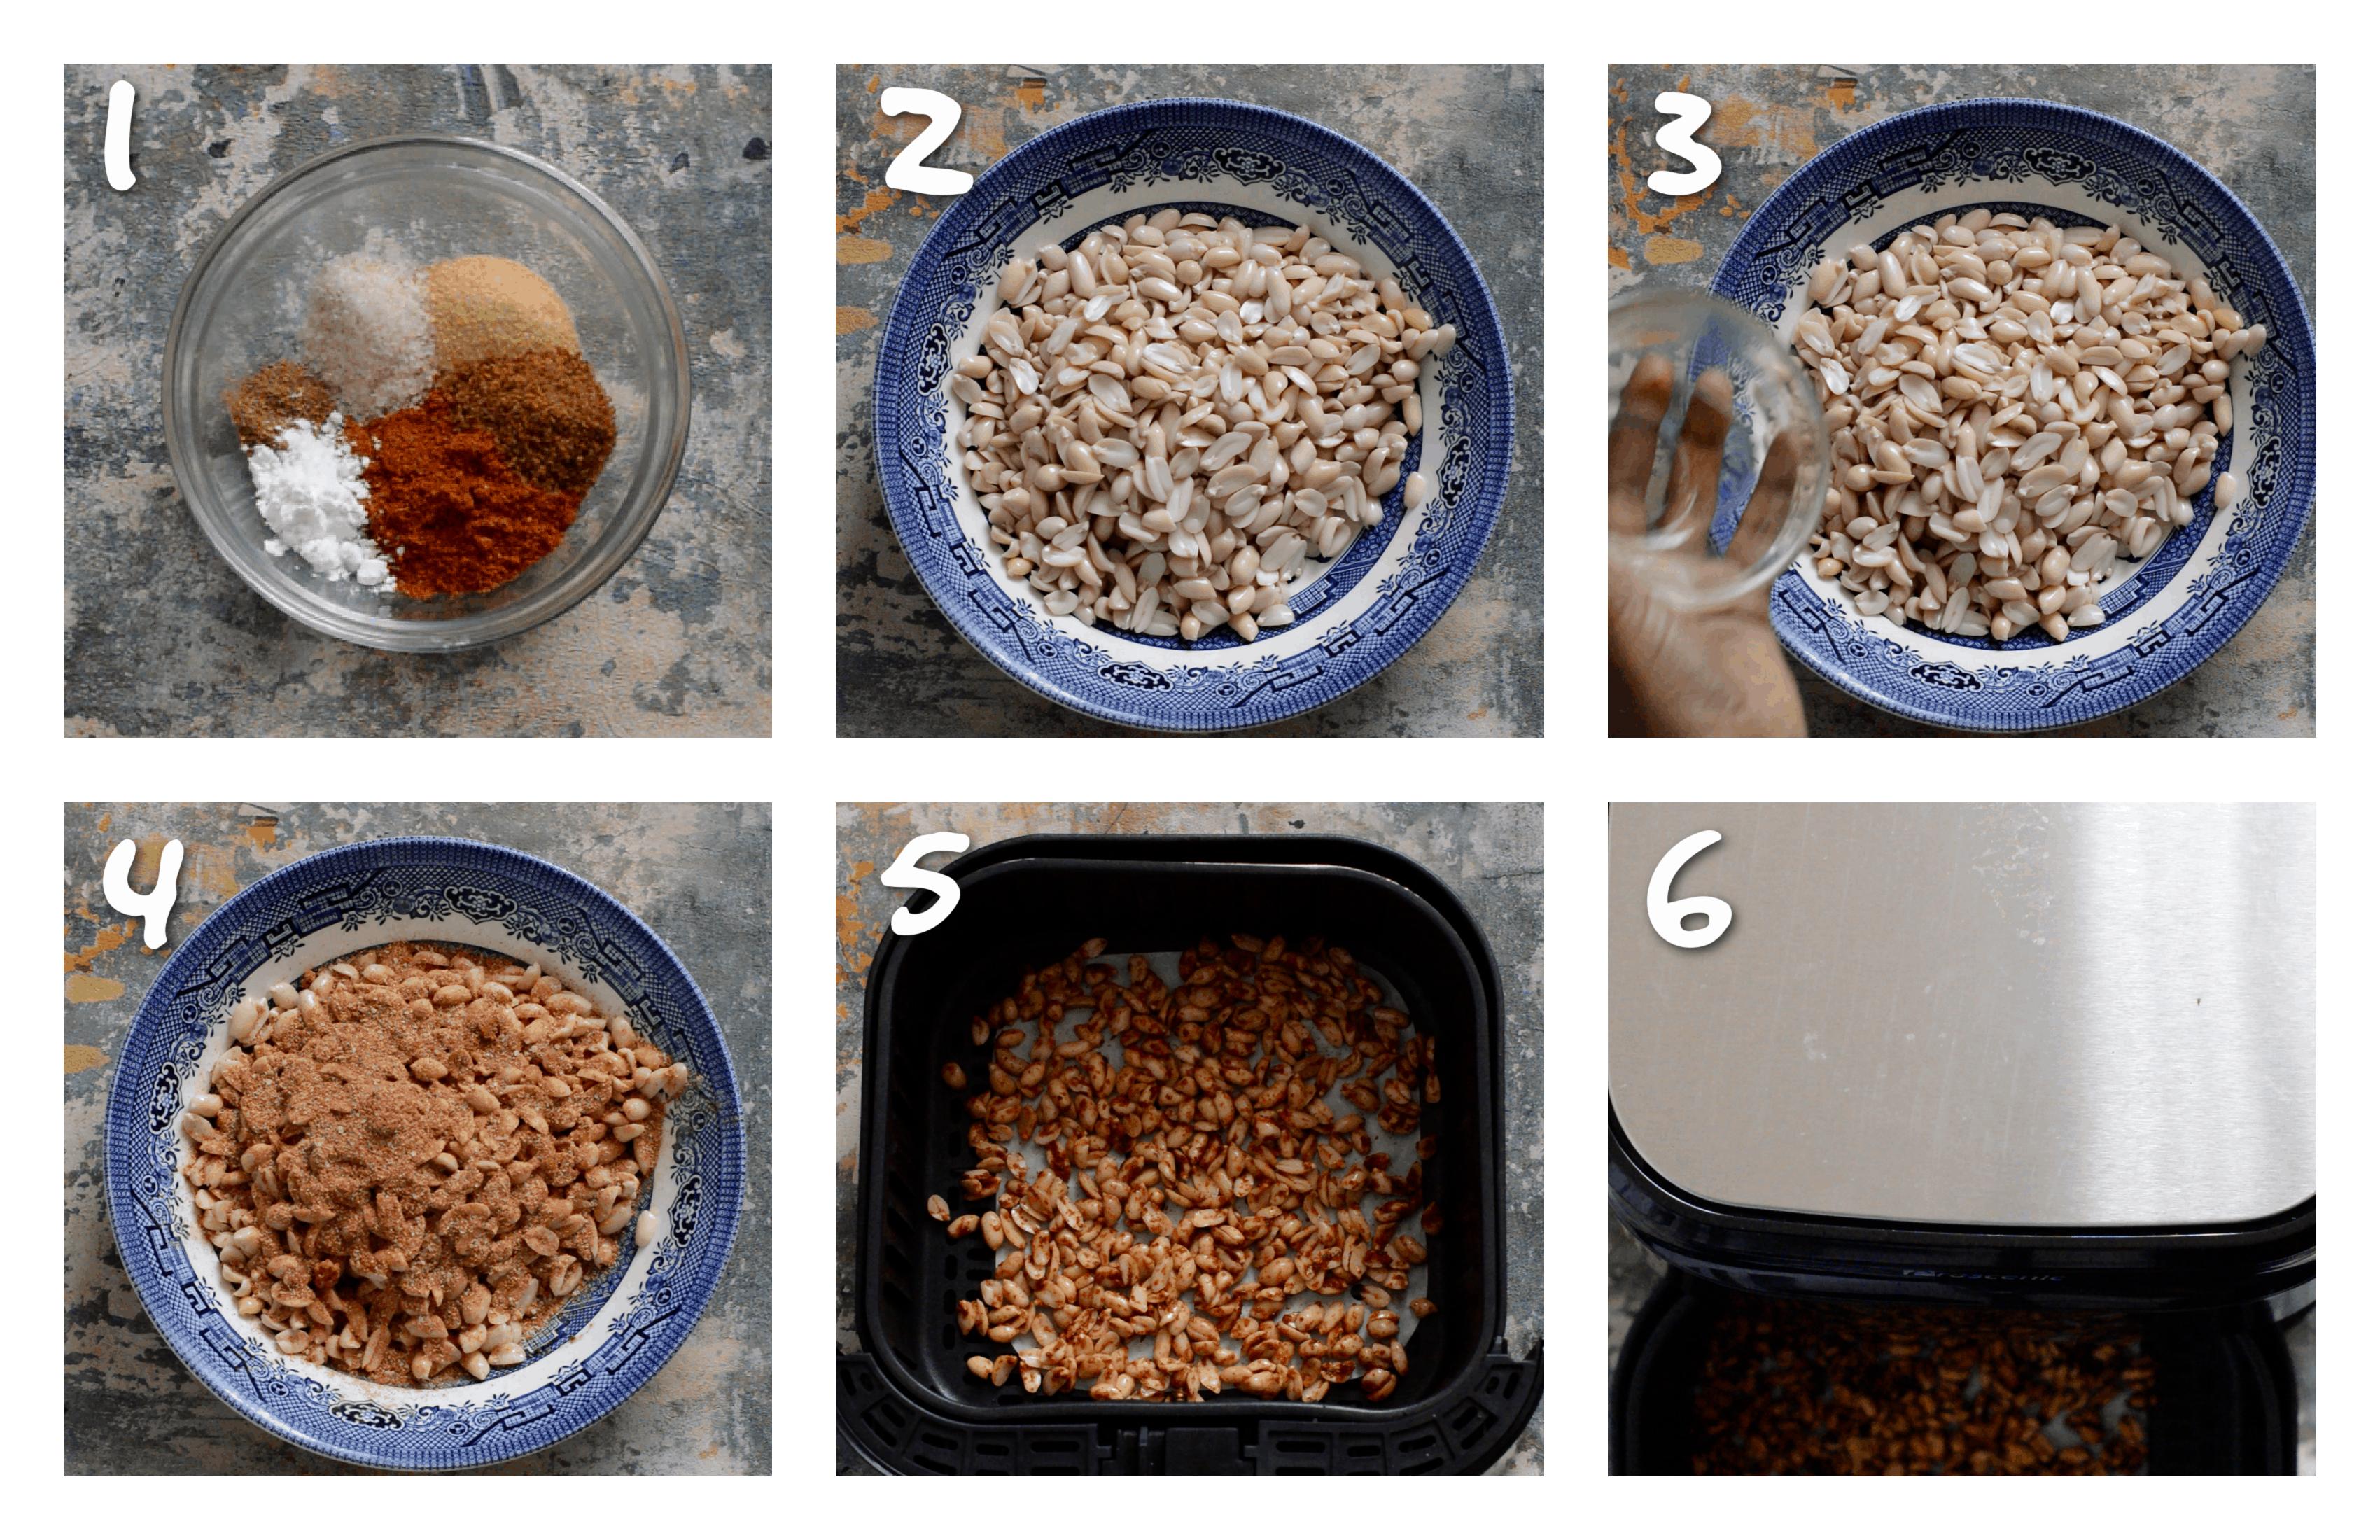 steps1-6 coating the peanuts